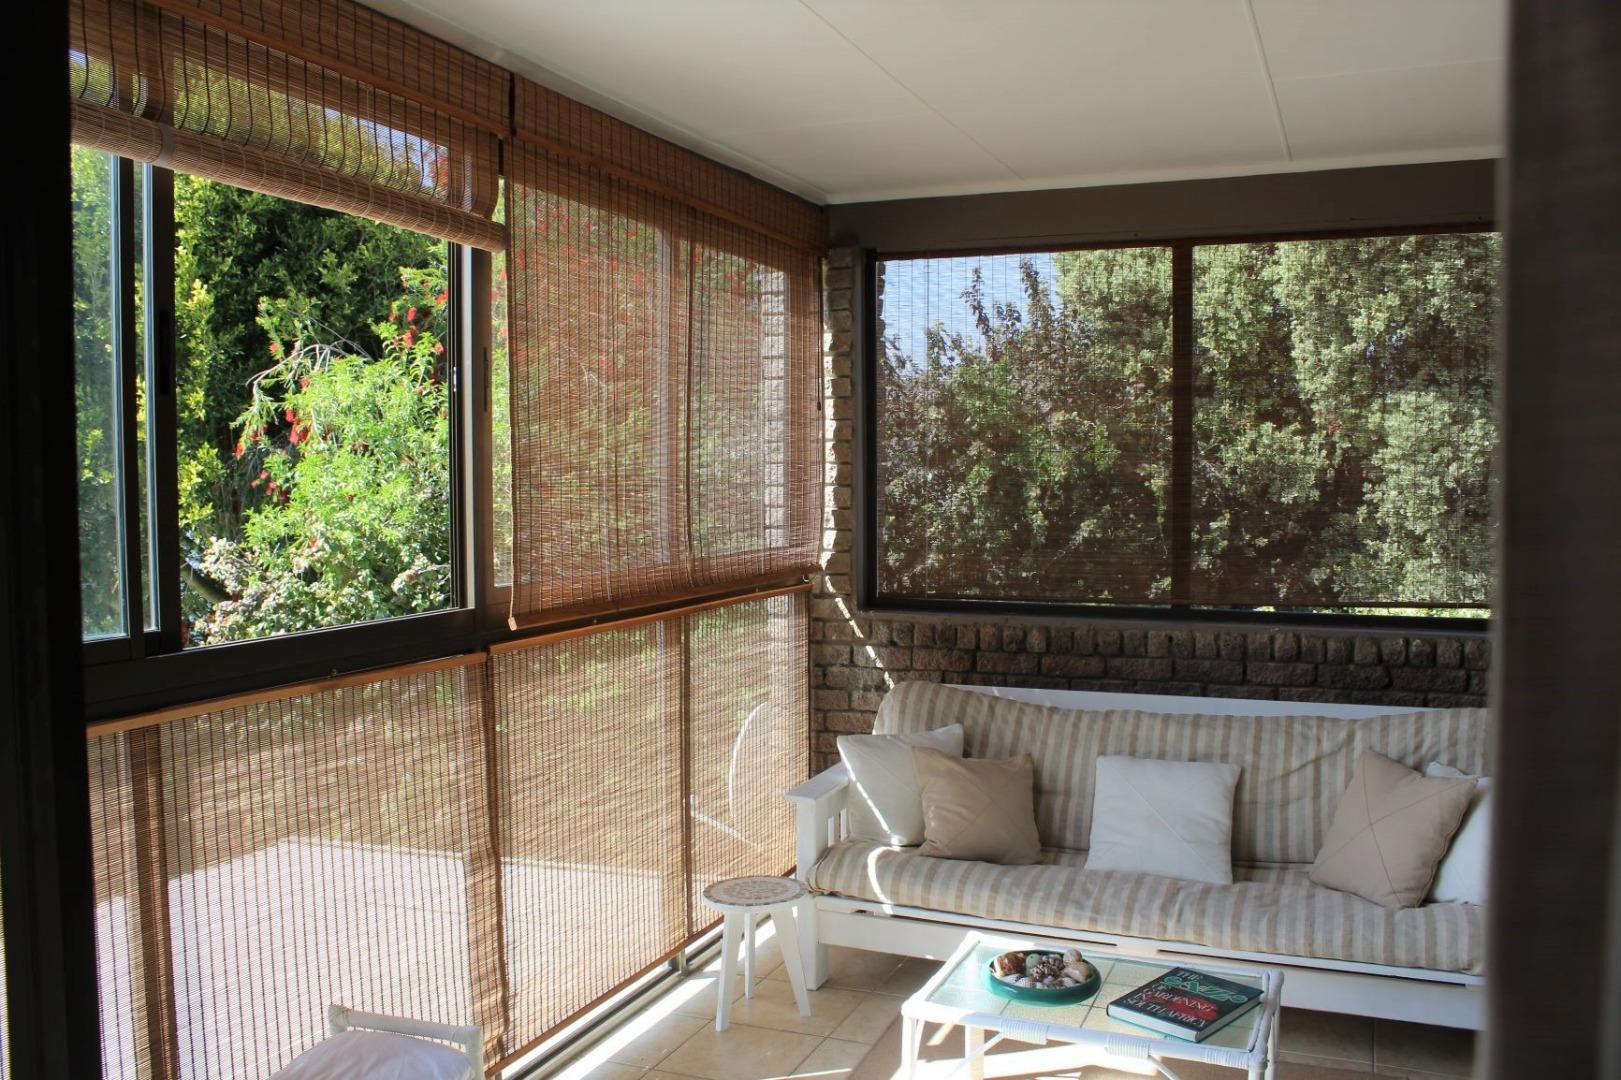 4 Bedroom House For Sale in Stilbaai Wes